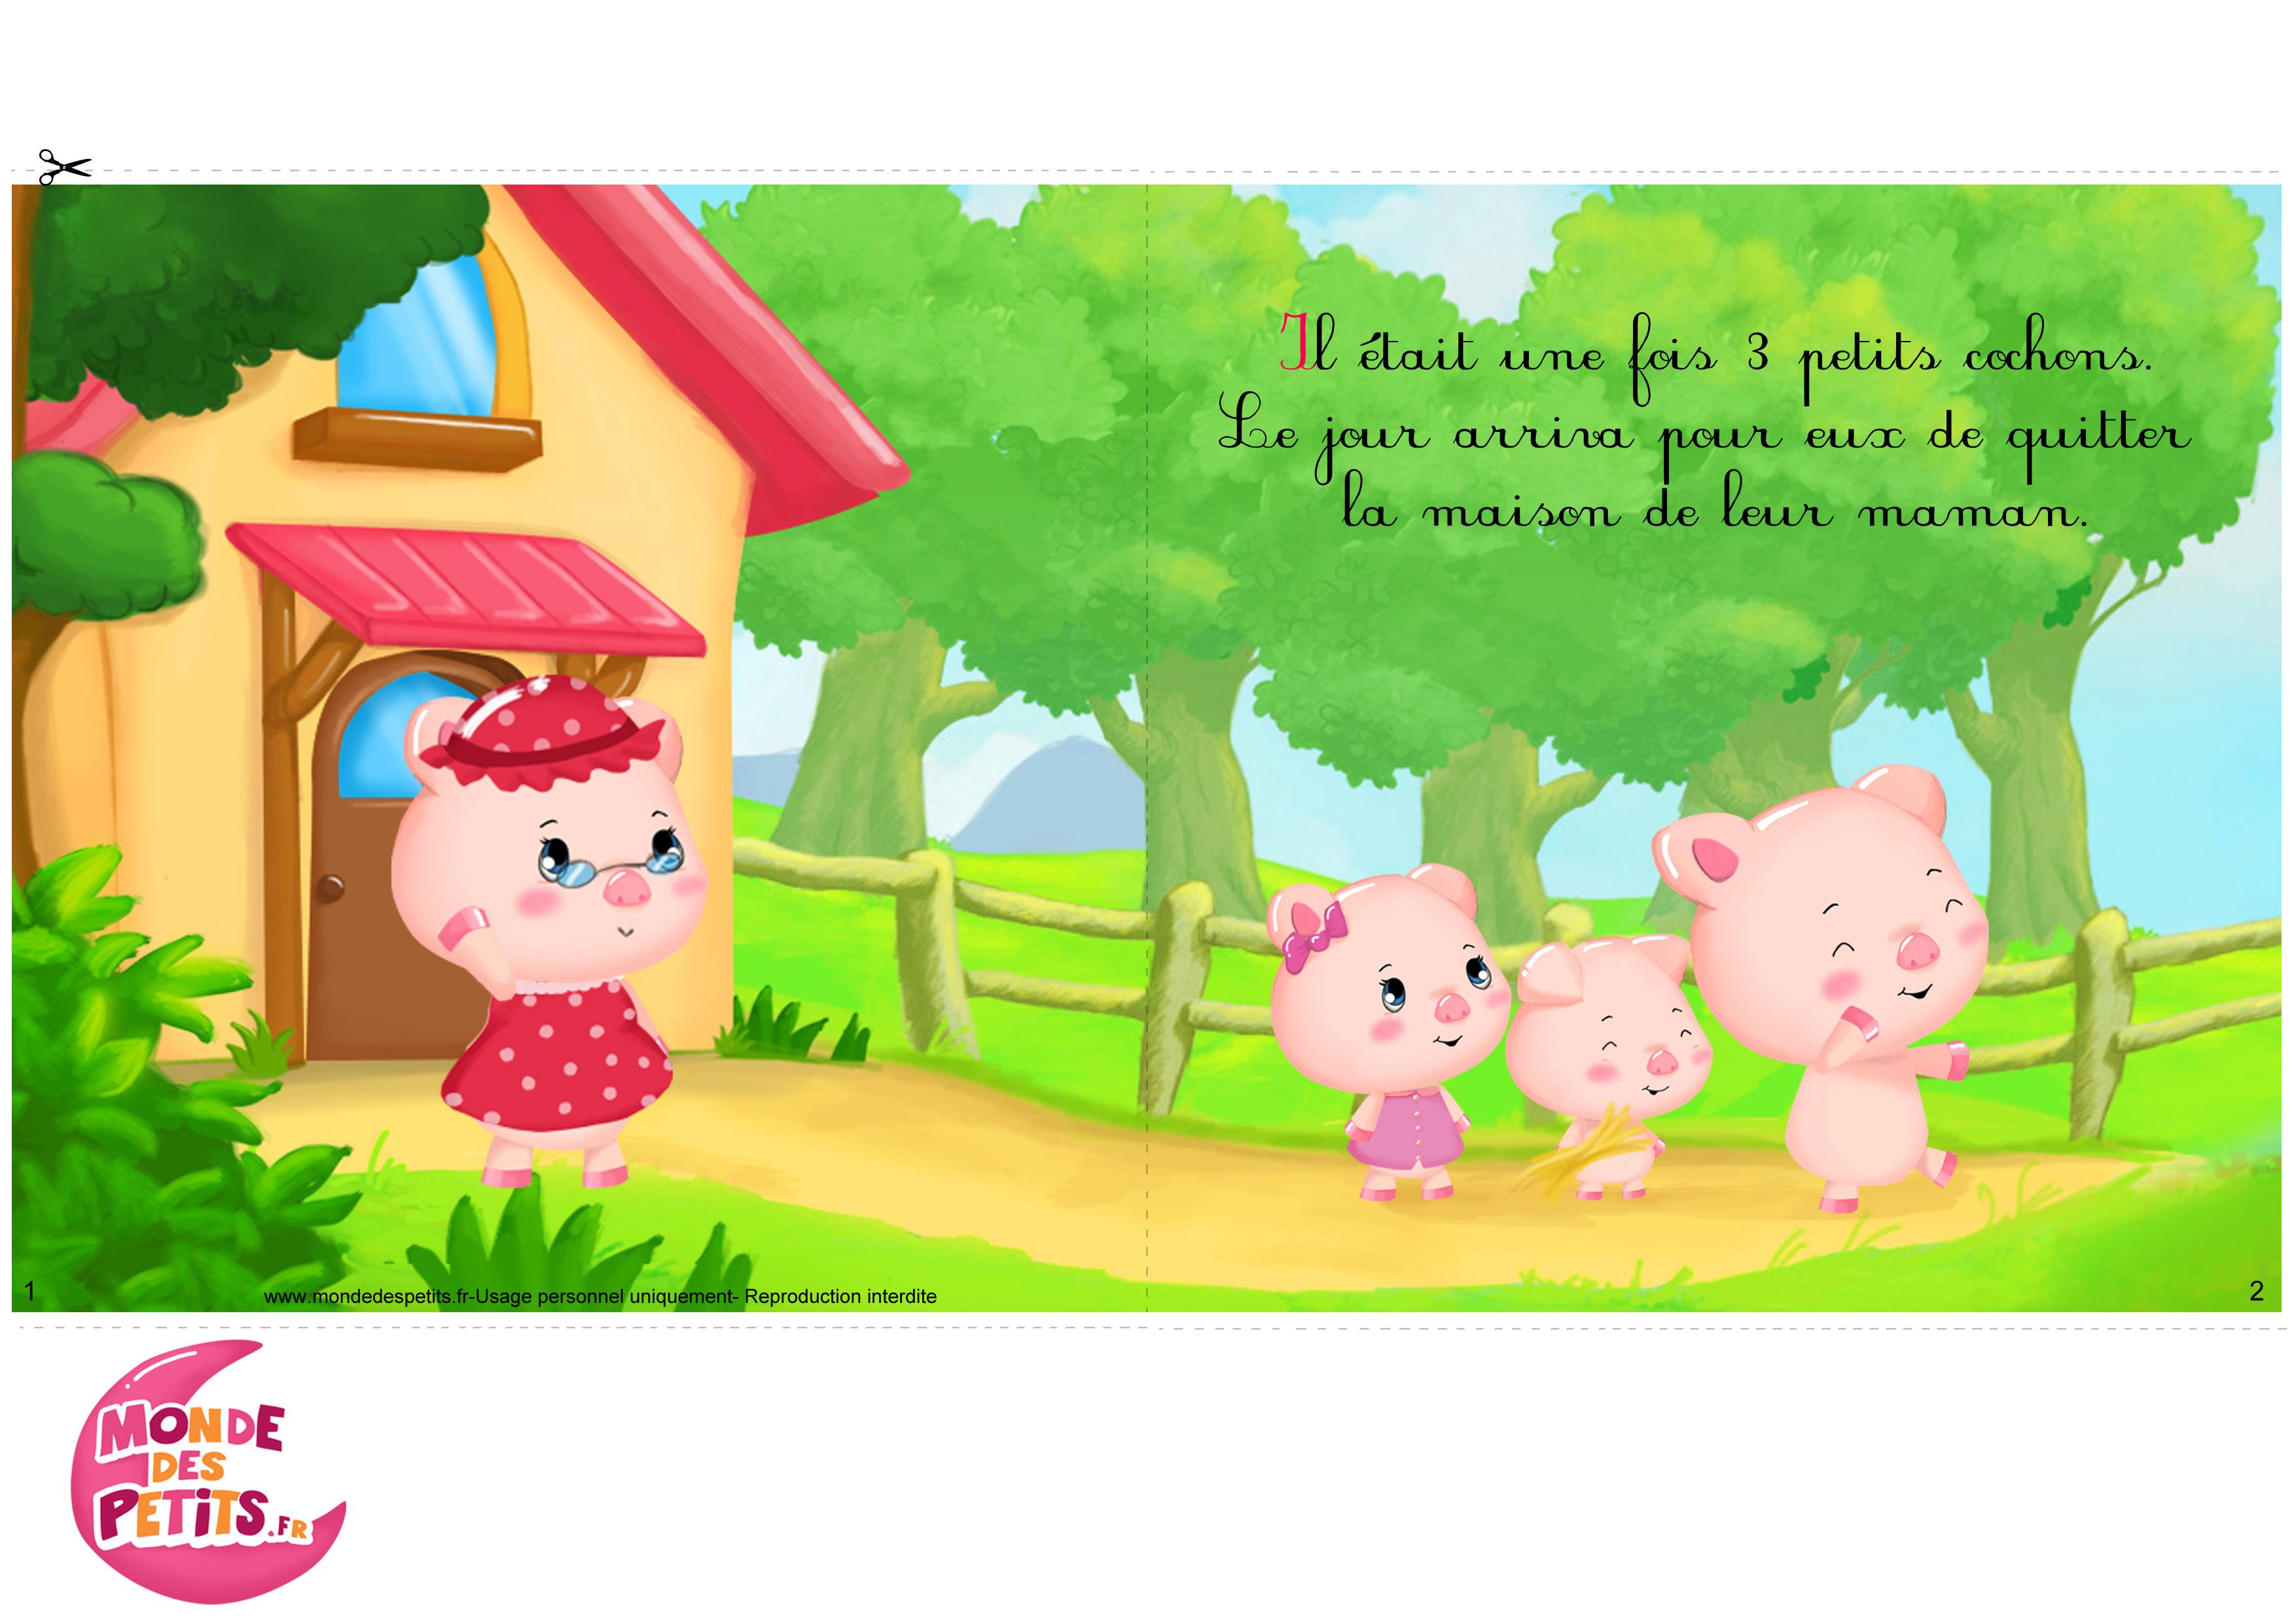 Monde des petits imprimer - Dessin 3 petit cochon ...